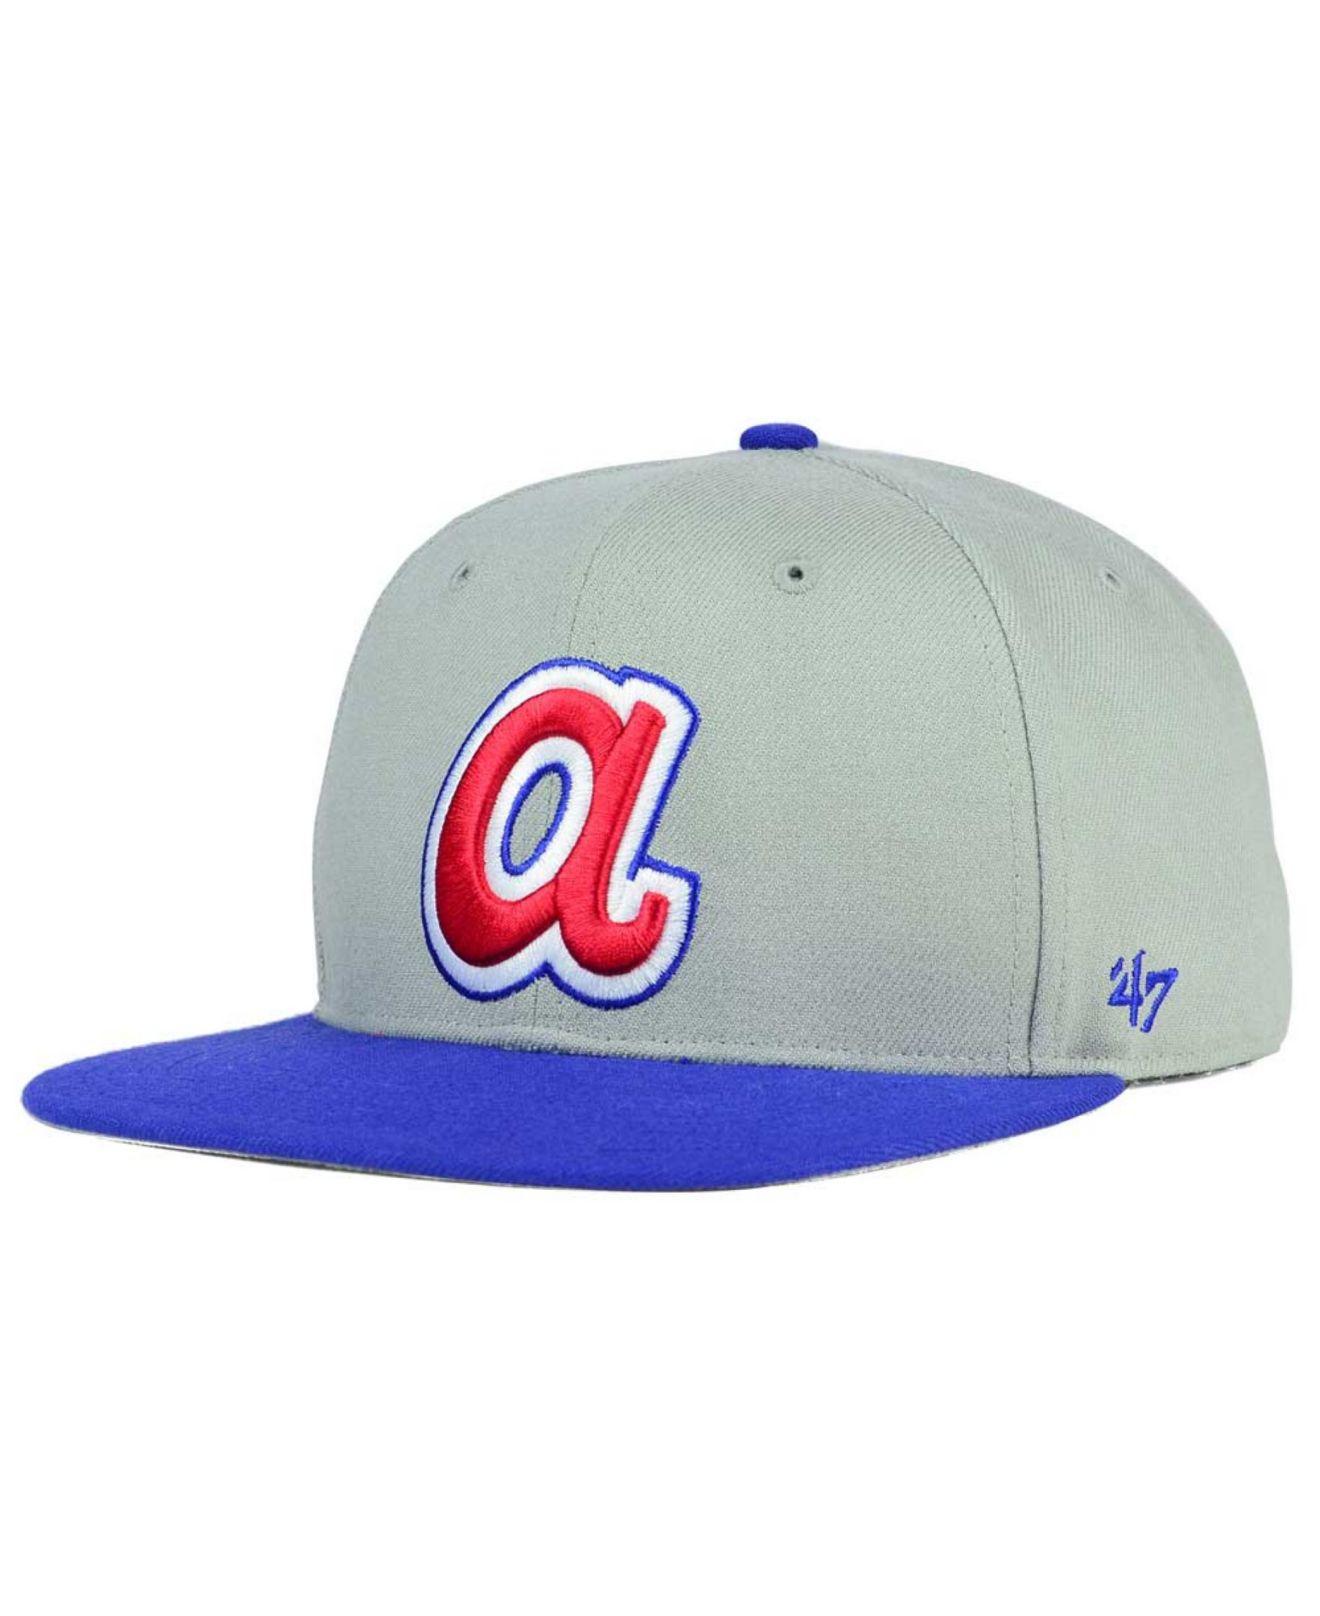 298e88c2 47 Brand Atlanta Braves Sure Shot Snapback Cap in Gray for Men - Lyst